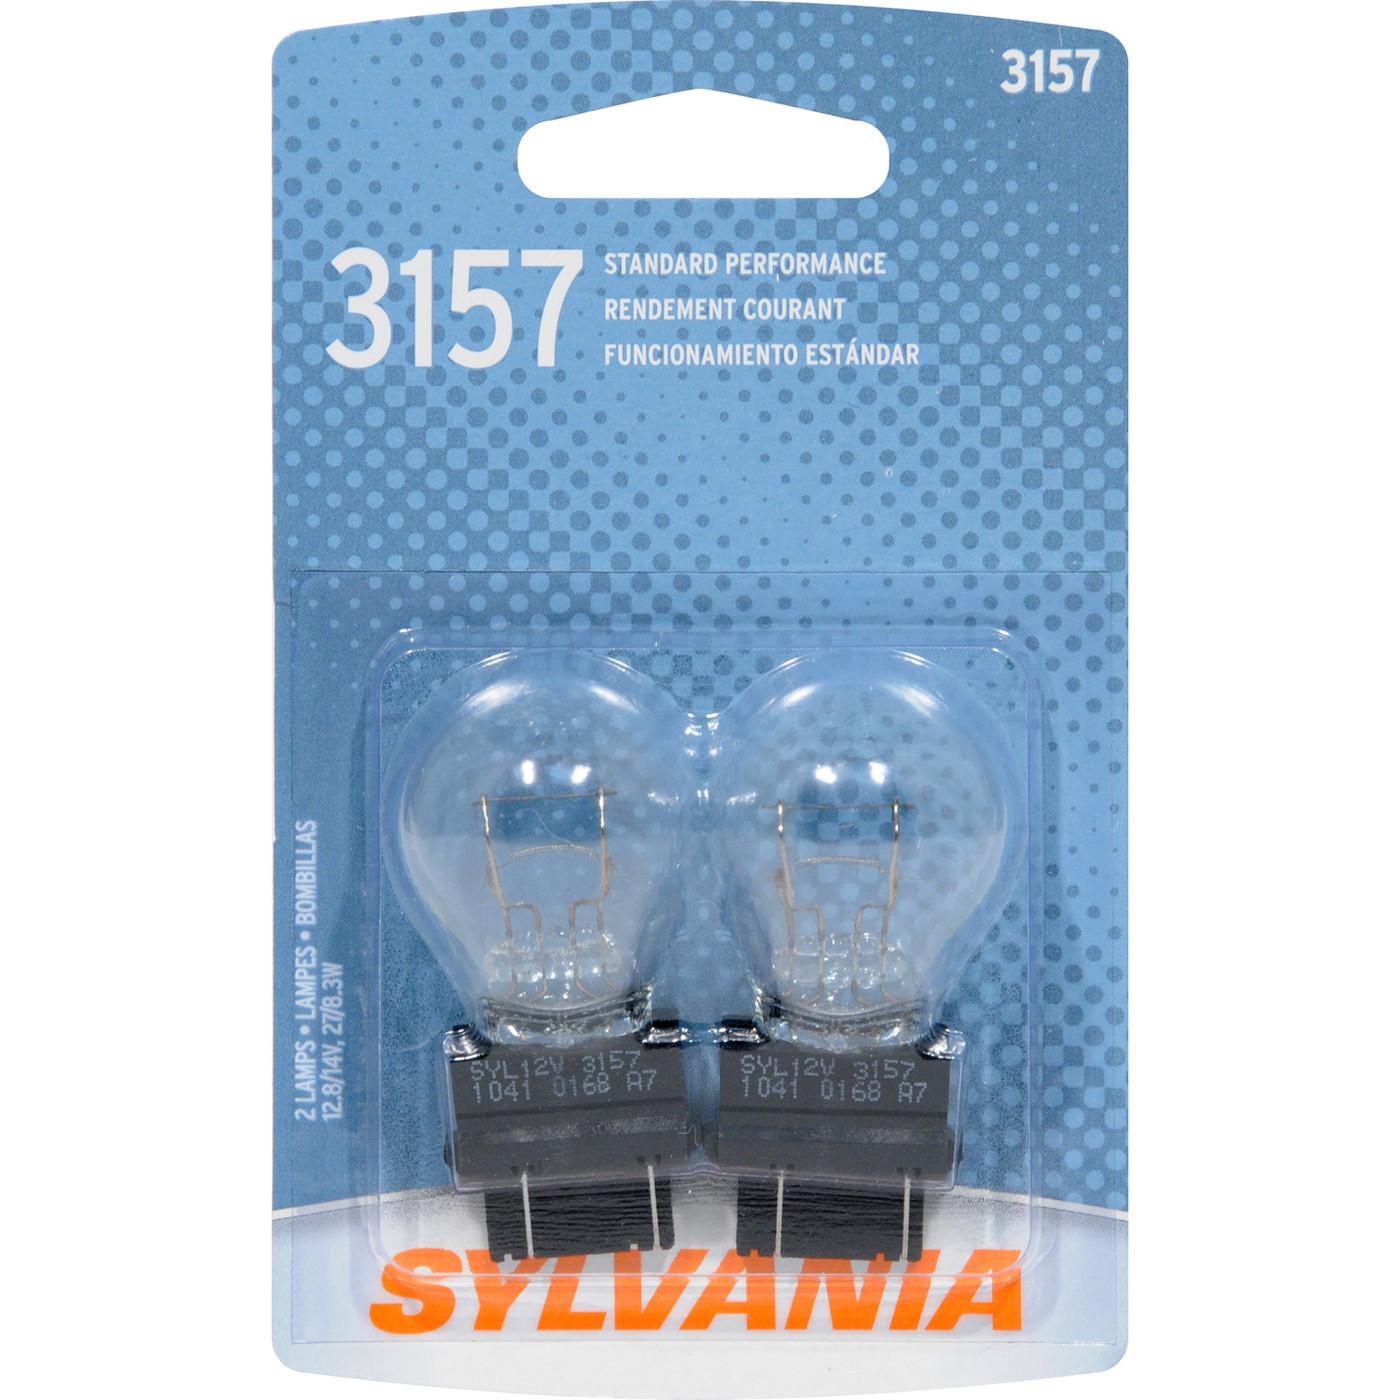 SYLVANIA RETAIL PACKS - Blister Pack Twin Center High Mount Stop Light Bulb - SYR 3157.BP2